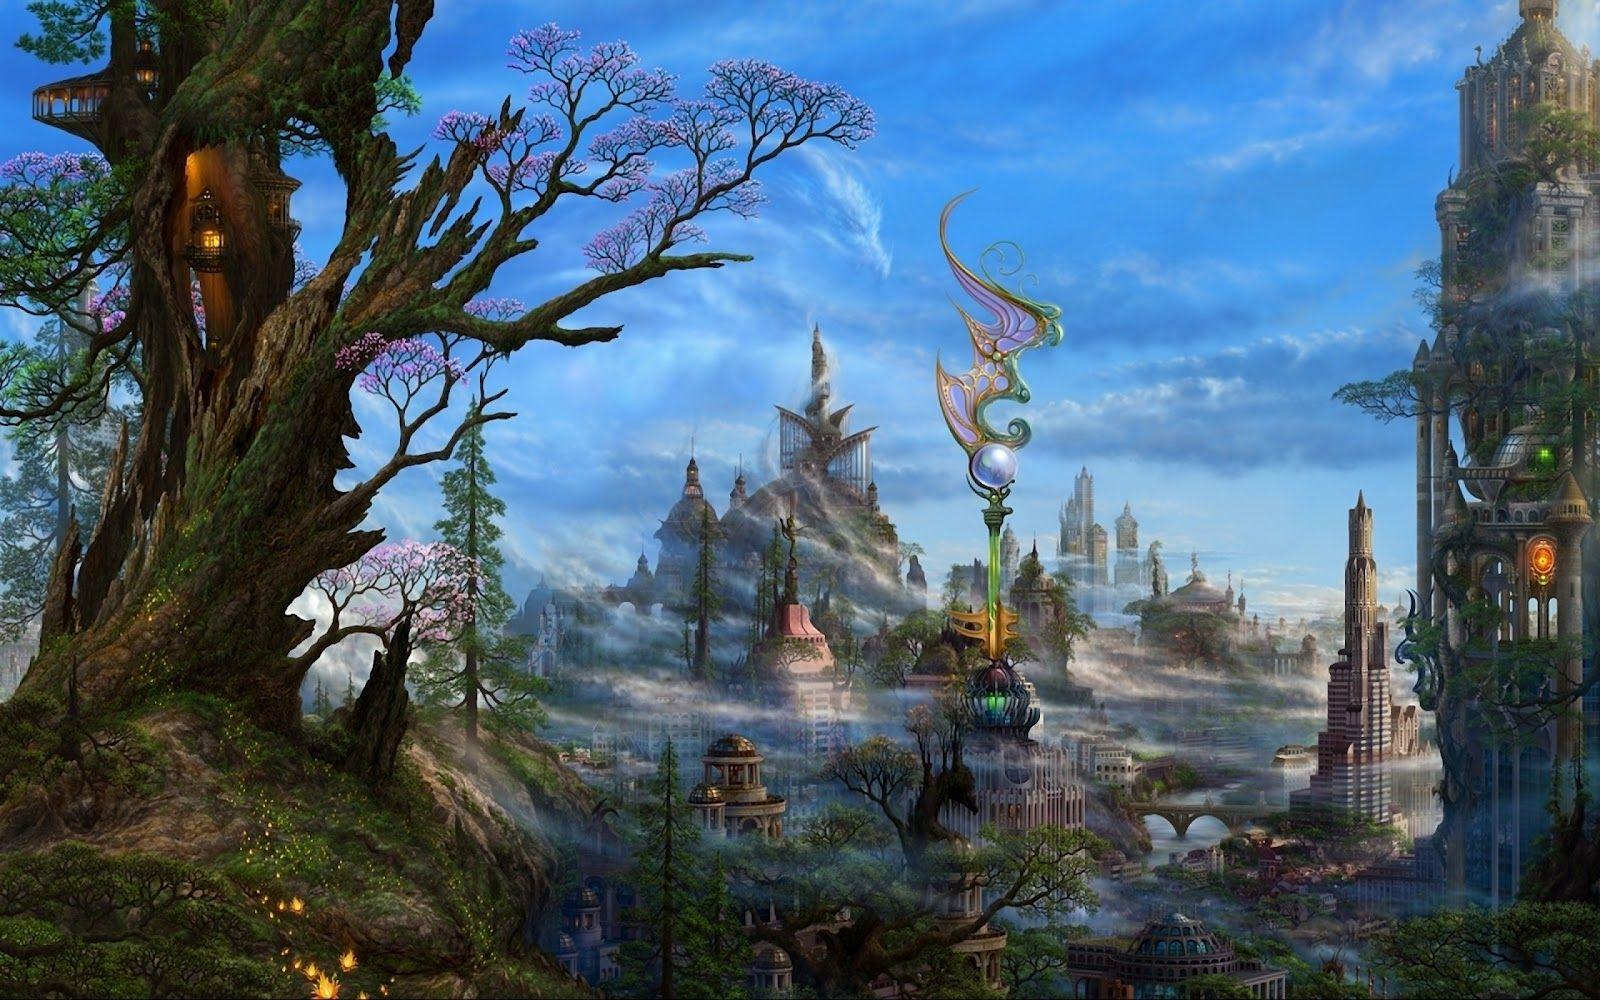 Windows 8 Wallpaper 3d Fantasy Landscape 1600 1000 High